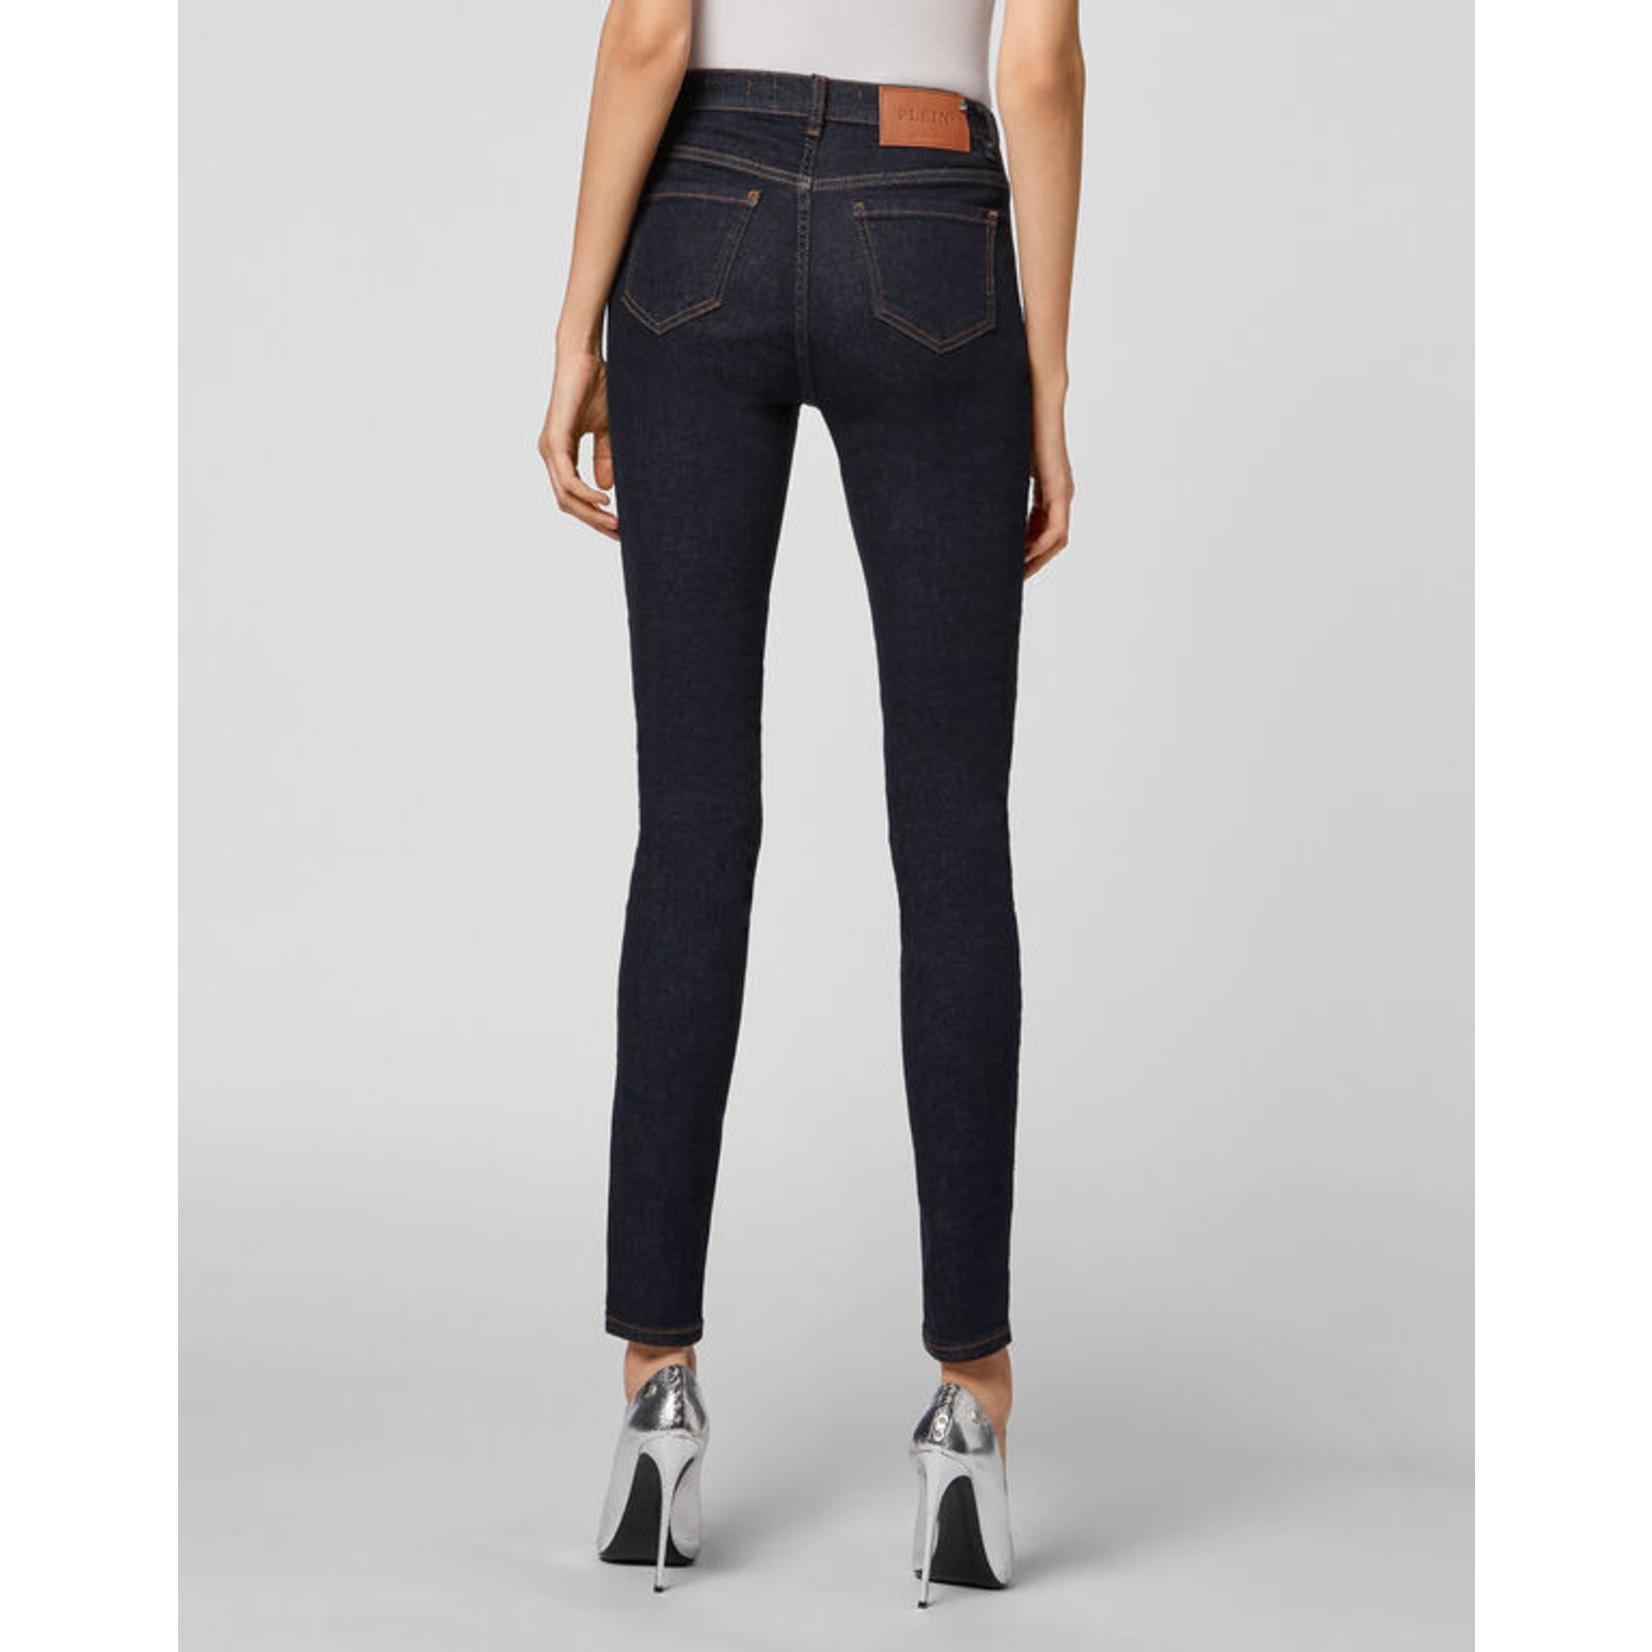 Philipp Plein Jeans 42858